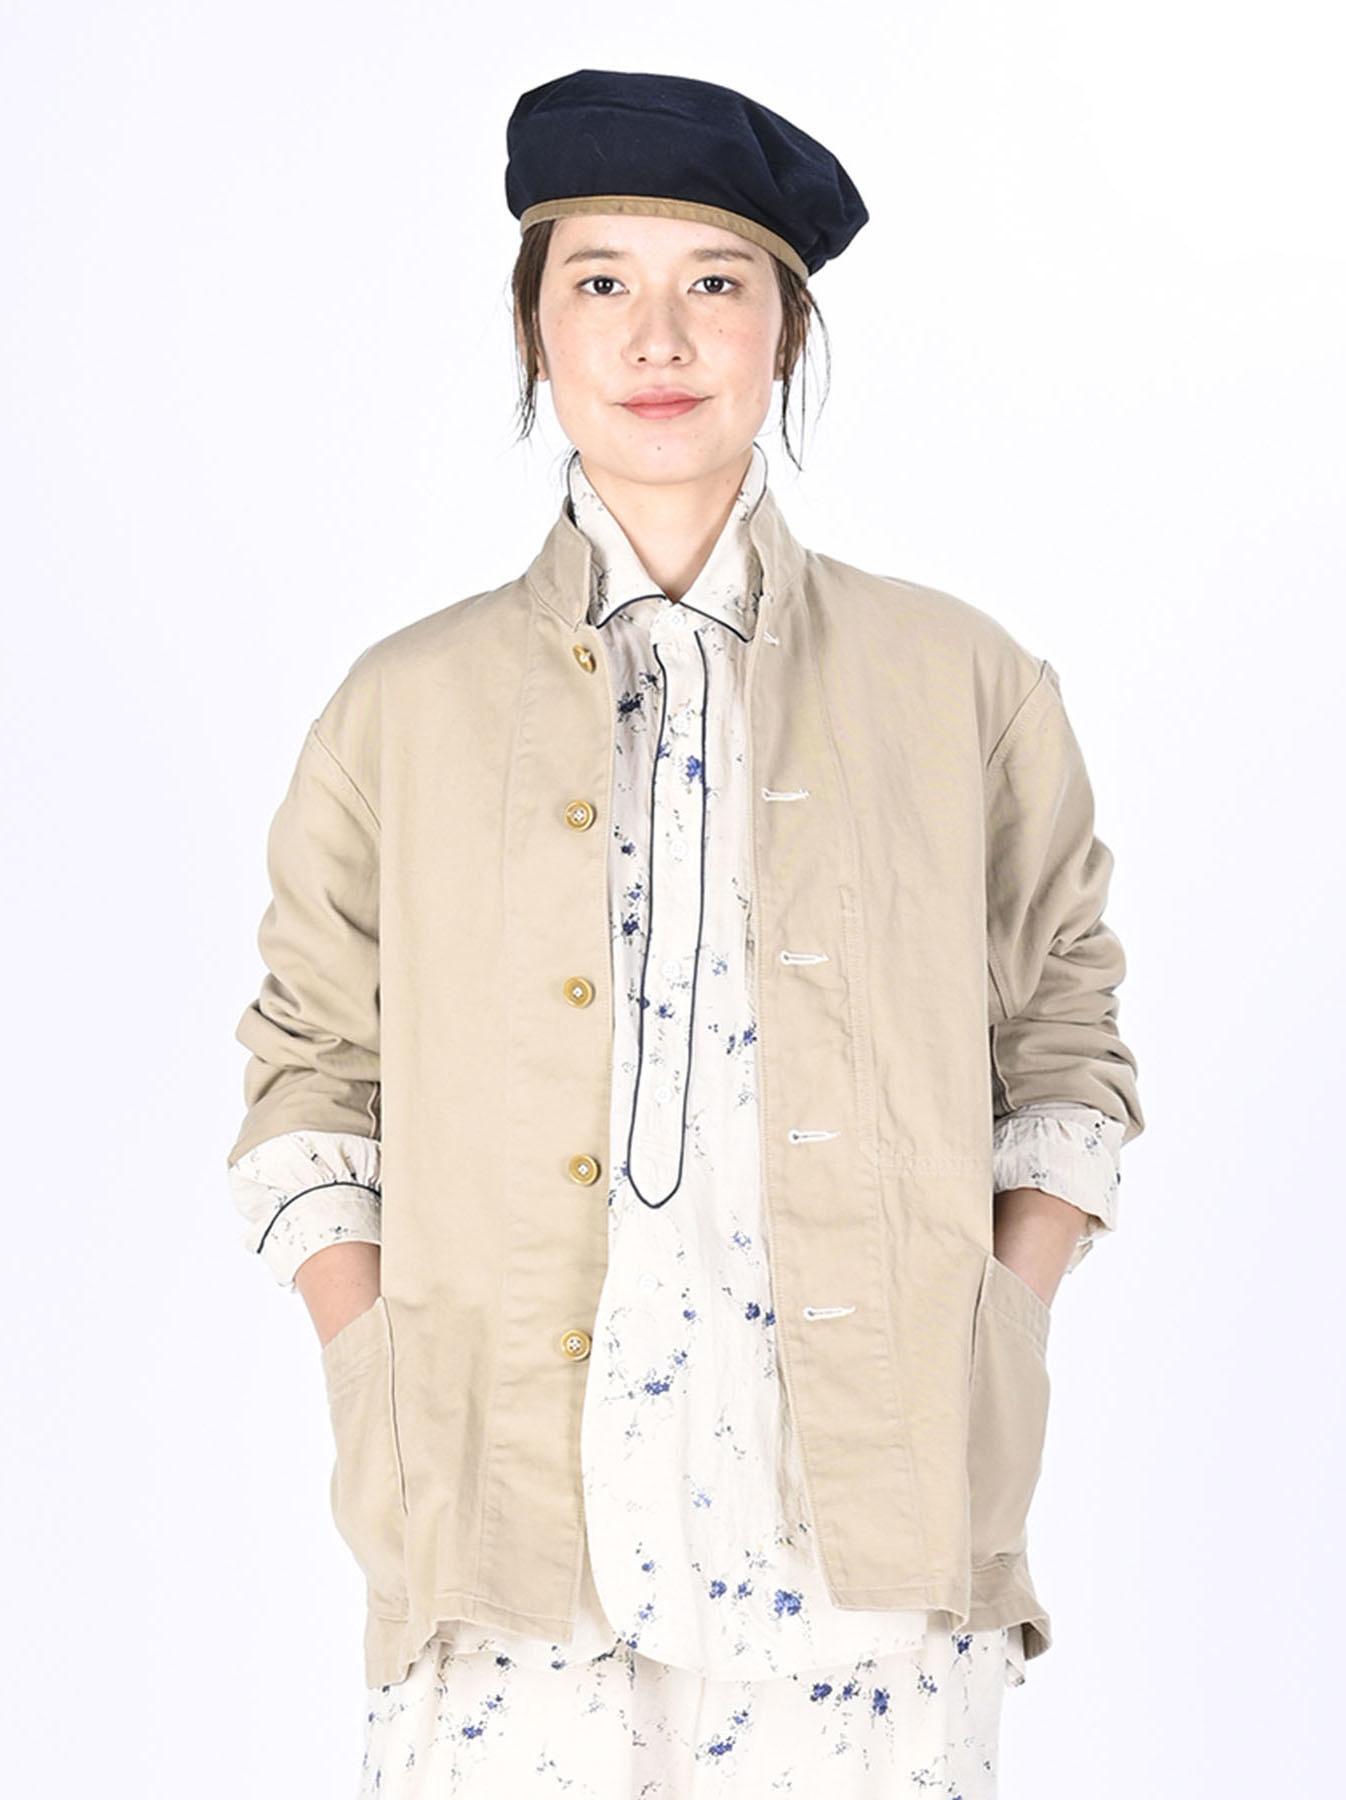 Okome Chino 908 Shirt Jacket-4